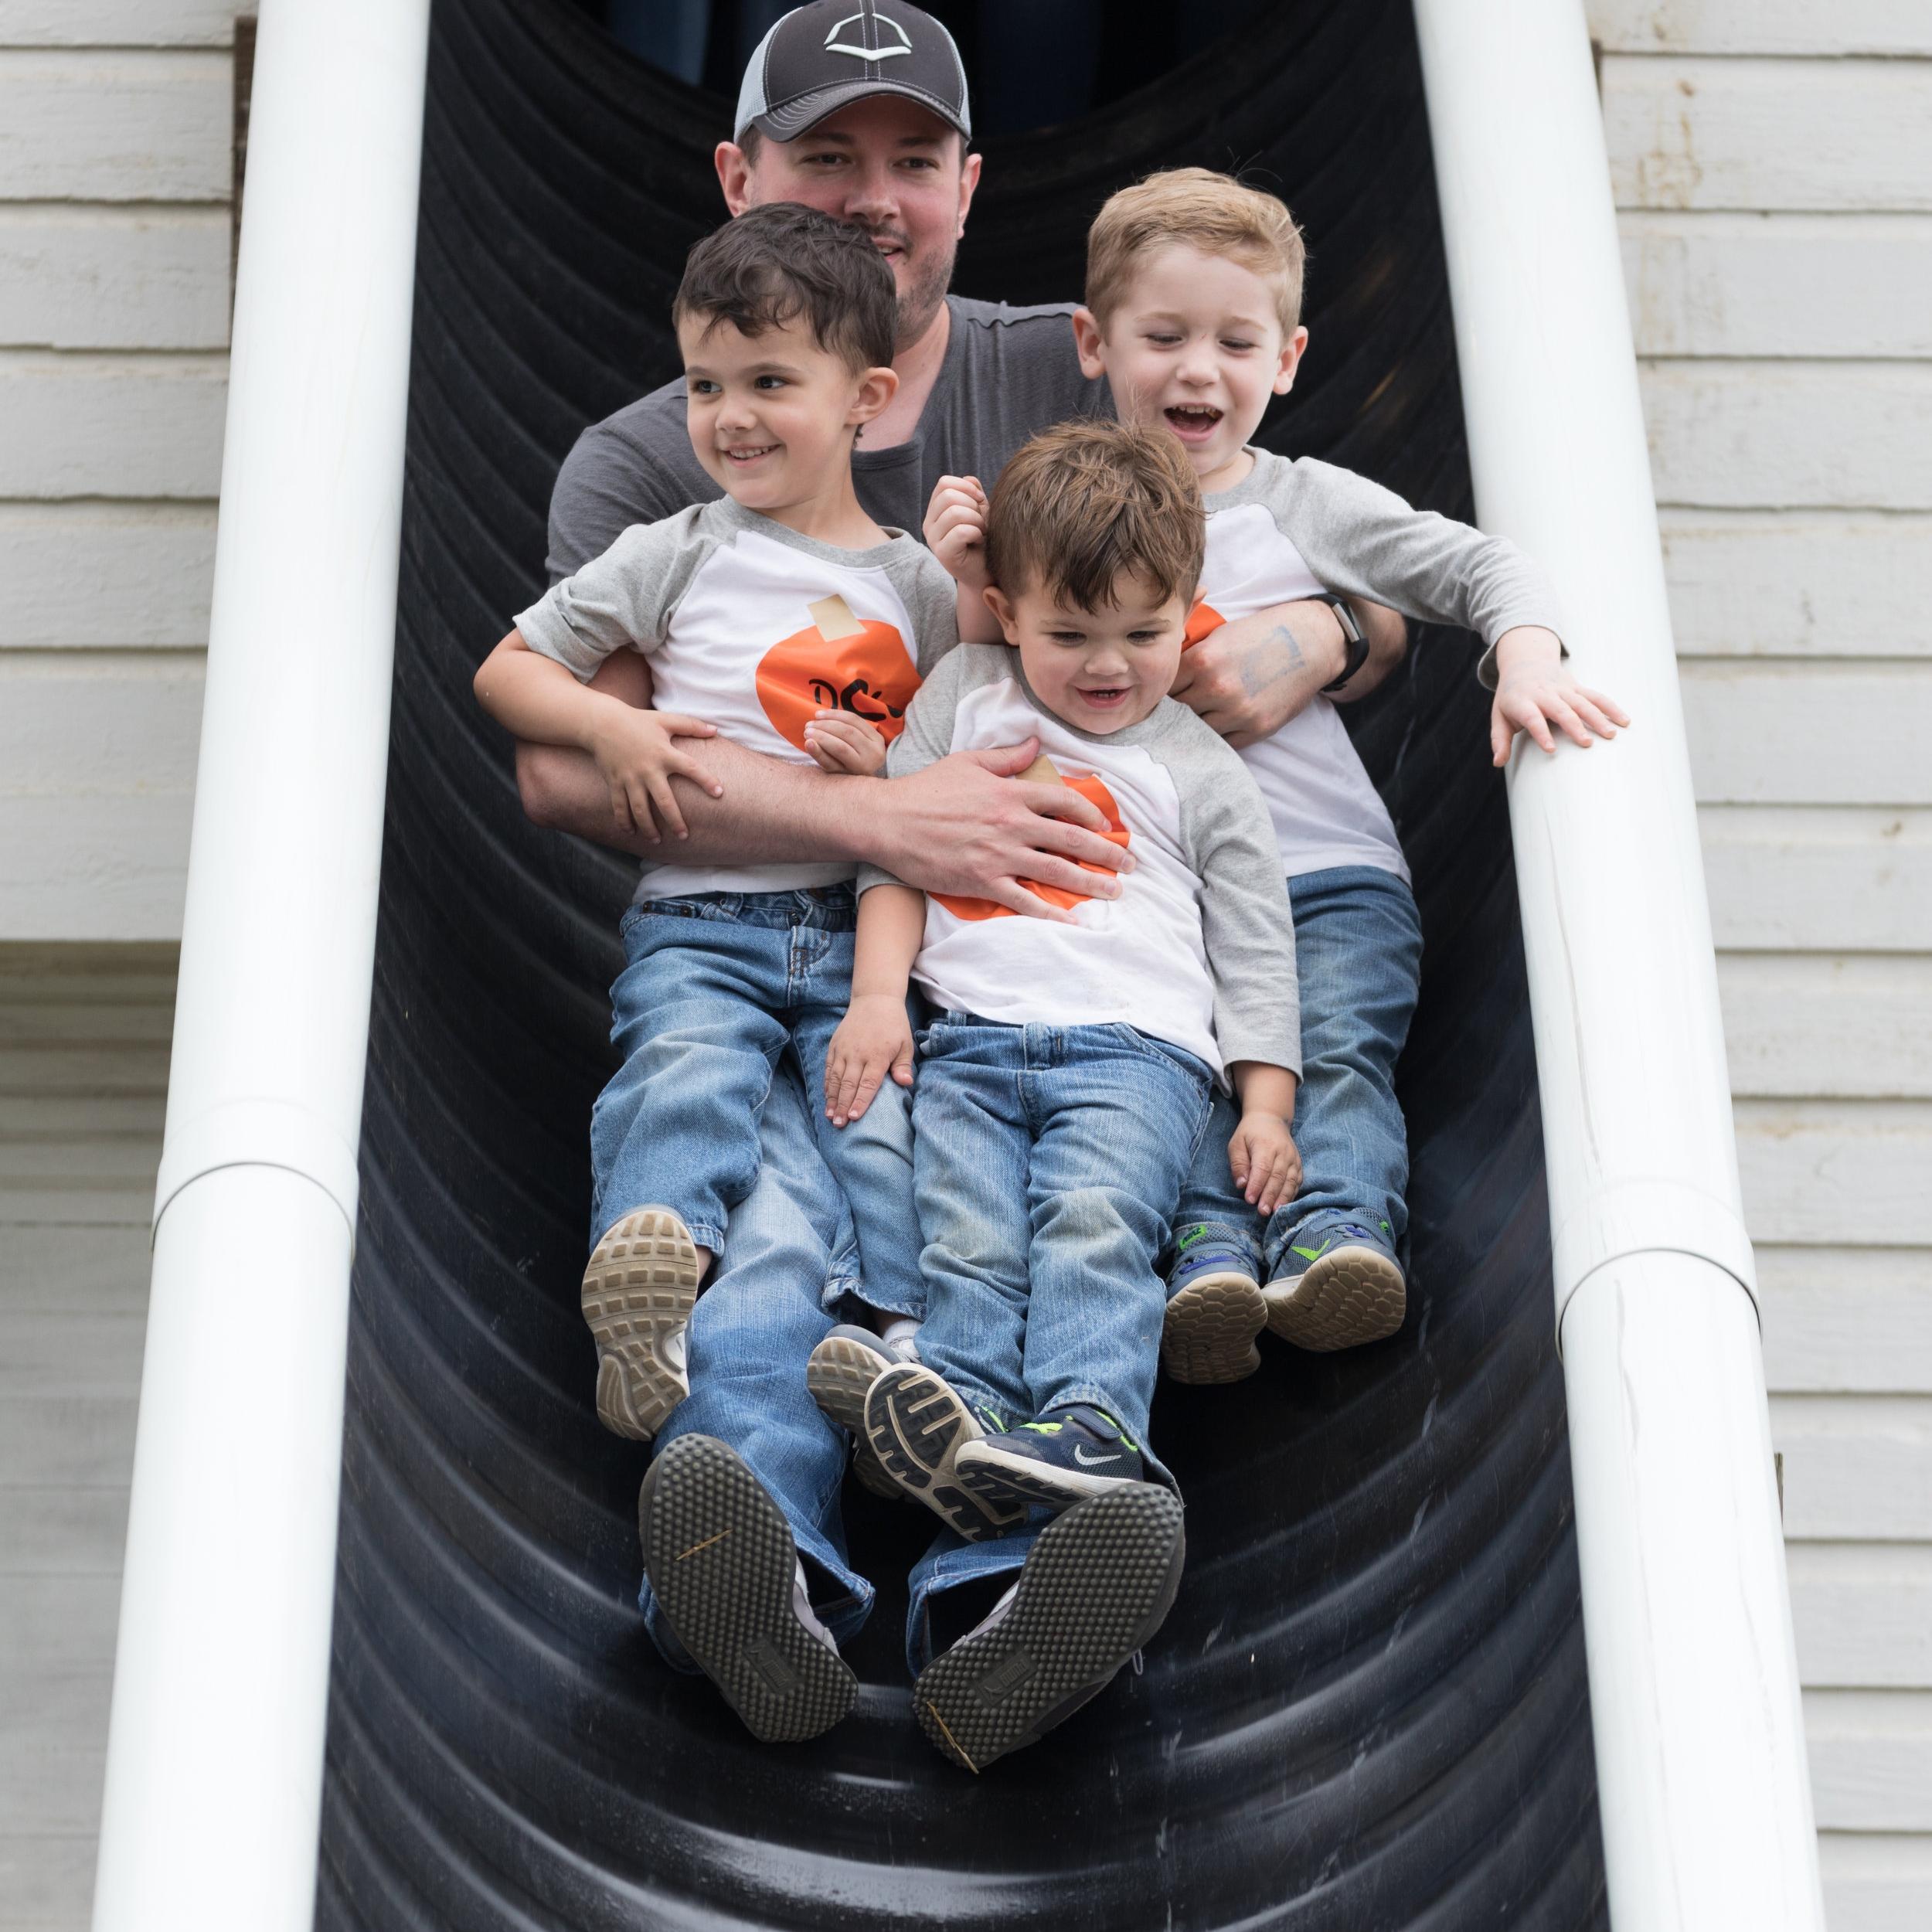 Giant Slides McDonald Farm Tennessee